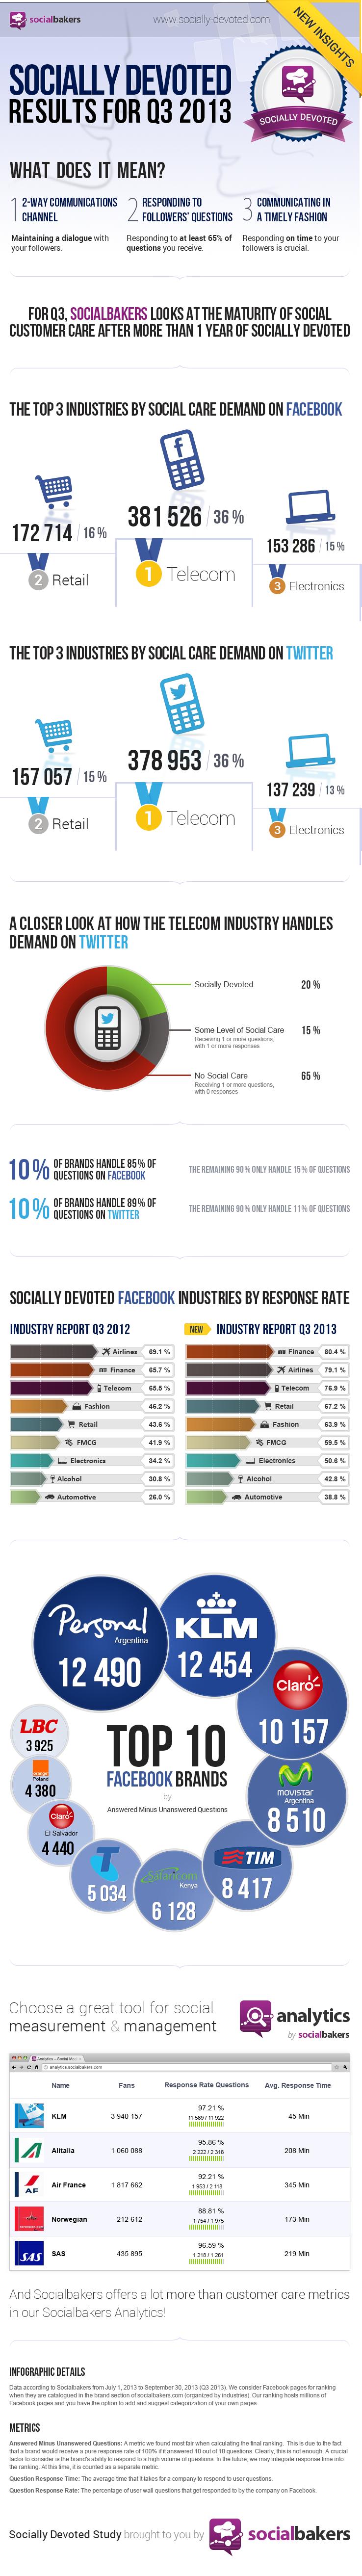 sociallydevoted-q3-2013